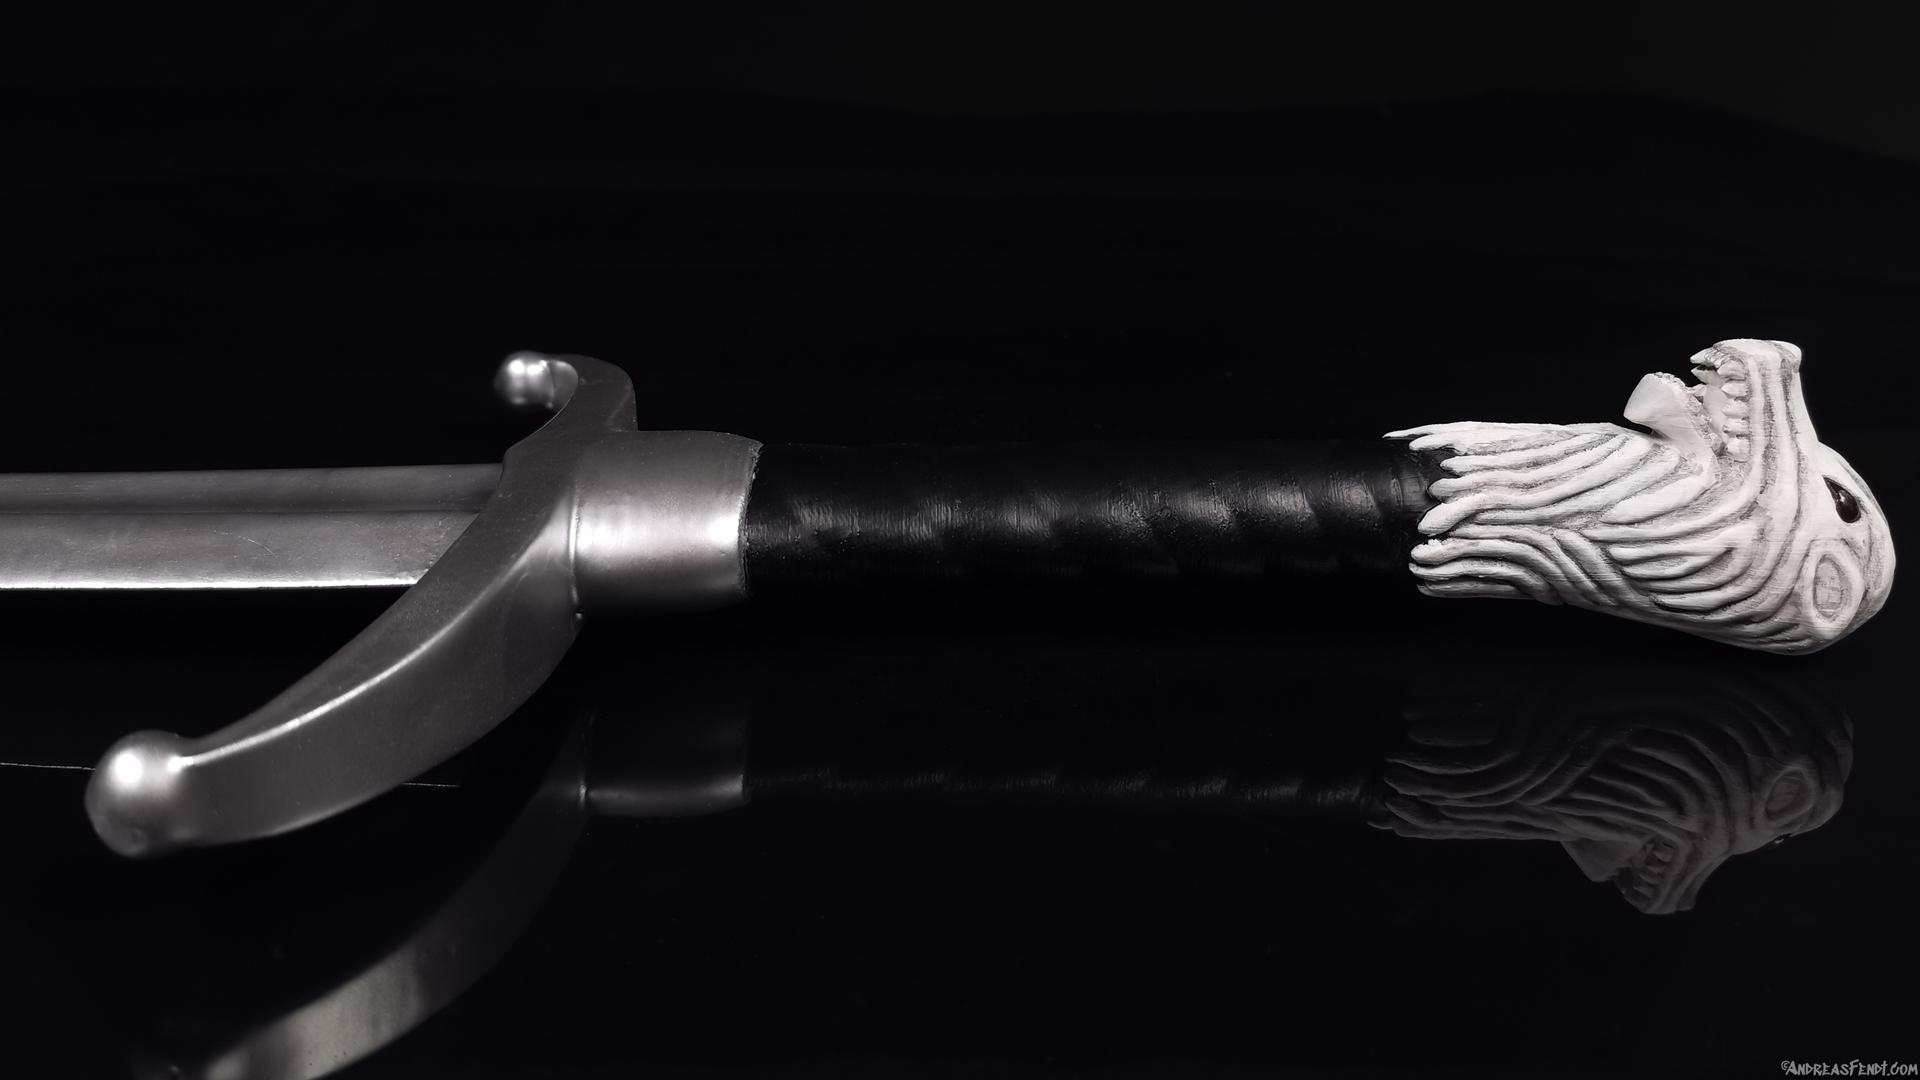 Game of Thrones GOT Longlaw Bastardsword 3D Print.jpg Télécharger fichier STL L'épée de Longclaw - L'épée de Jon Snow de Game of Thrones • Objet à imprimer en 3D, Andreasfendt